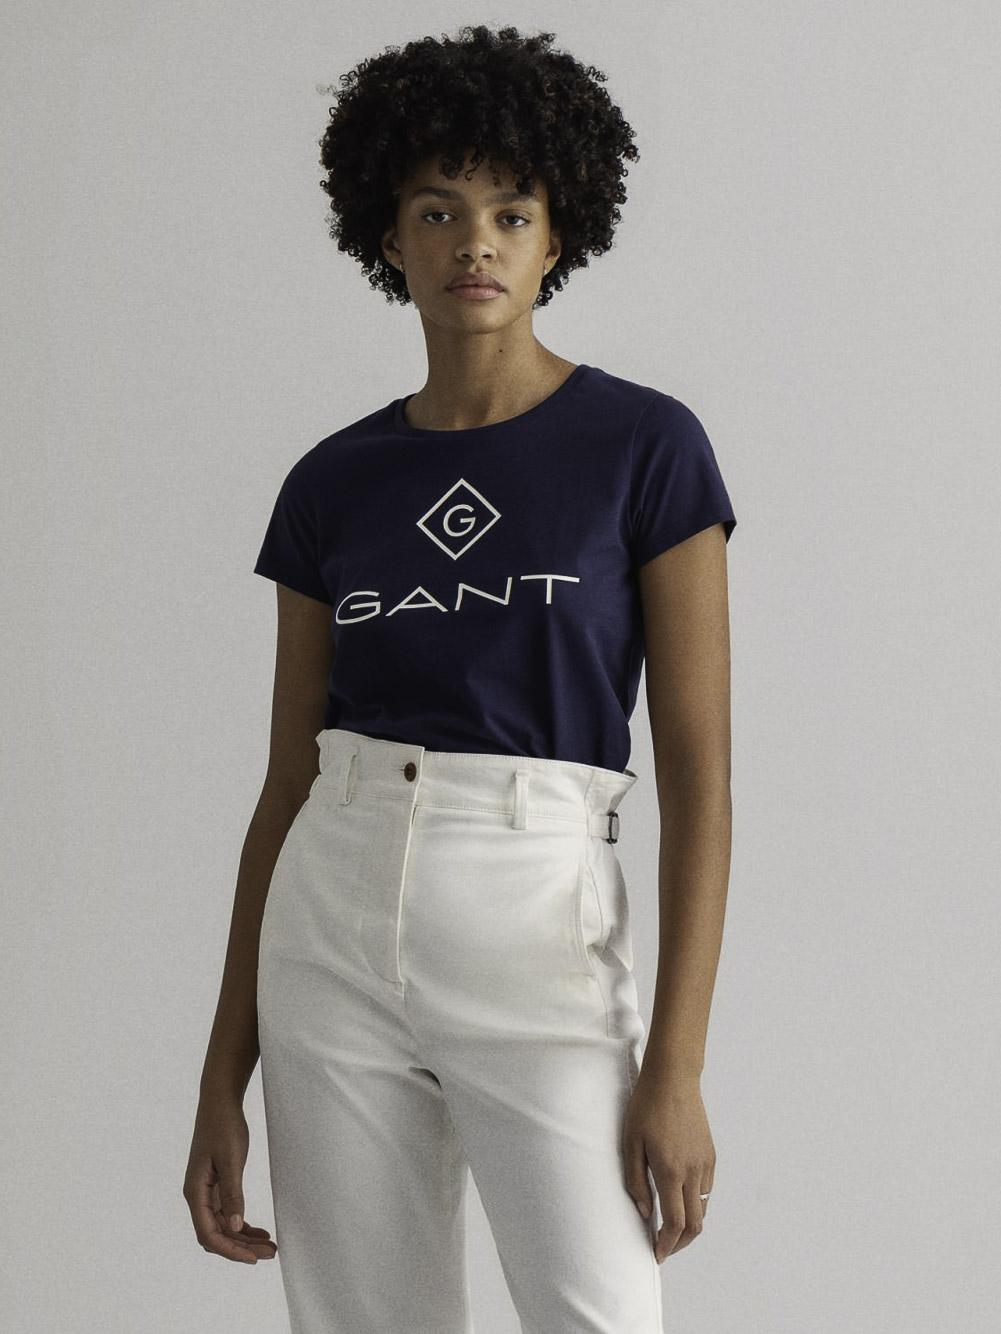 GANT Mπλούζα t-shirt 3GW4200396-433 ΣΚΟΥΡΟ ΜΠΛΕ